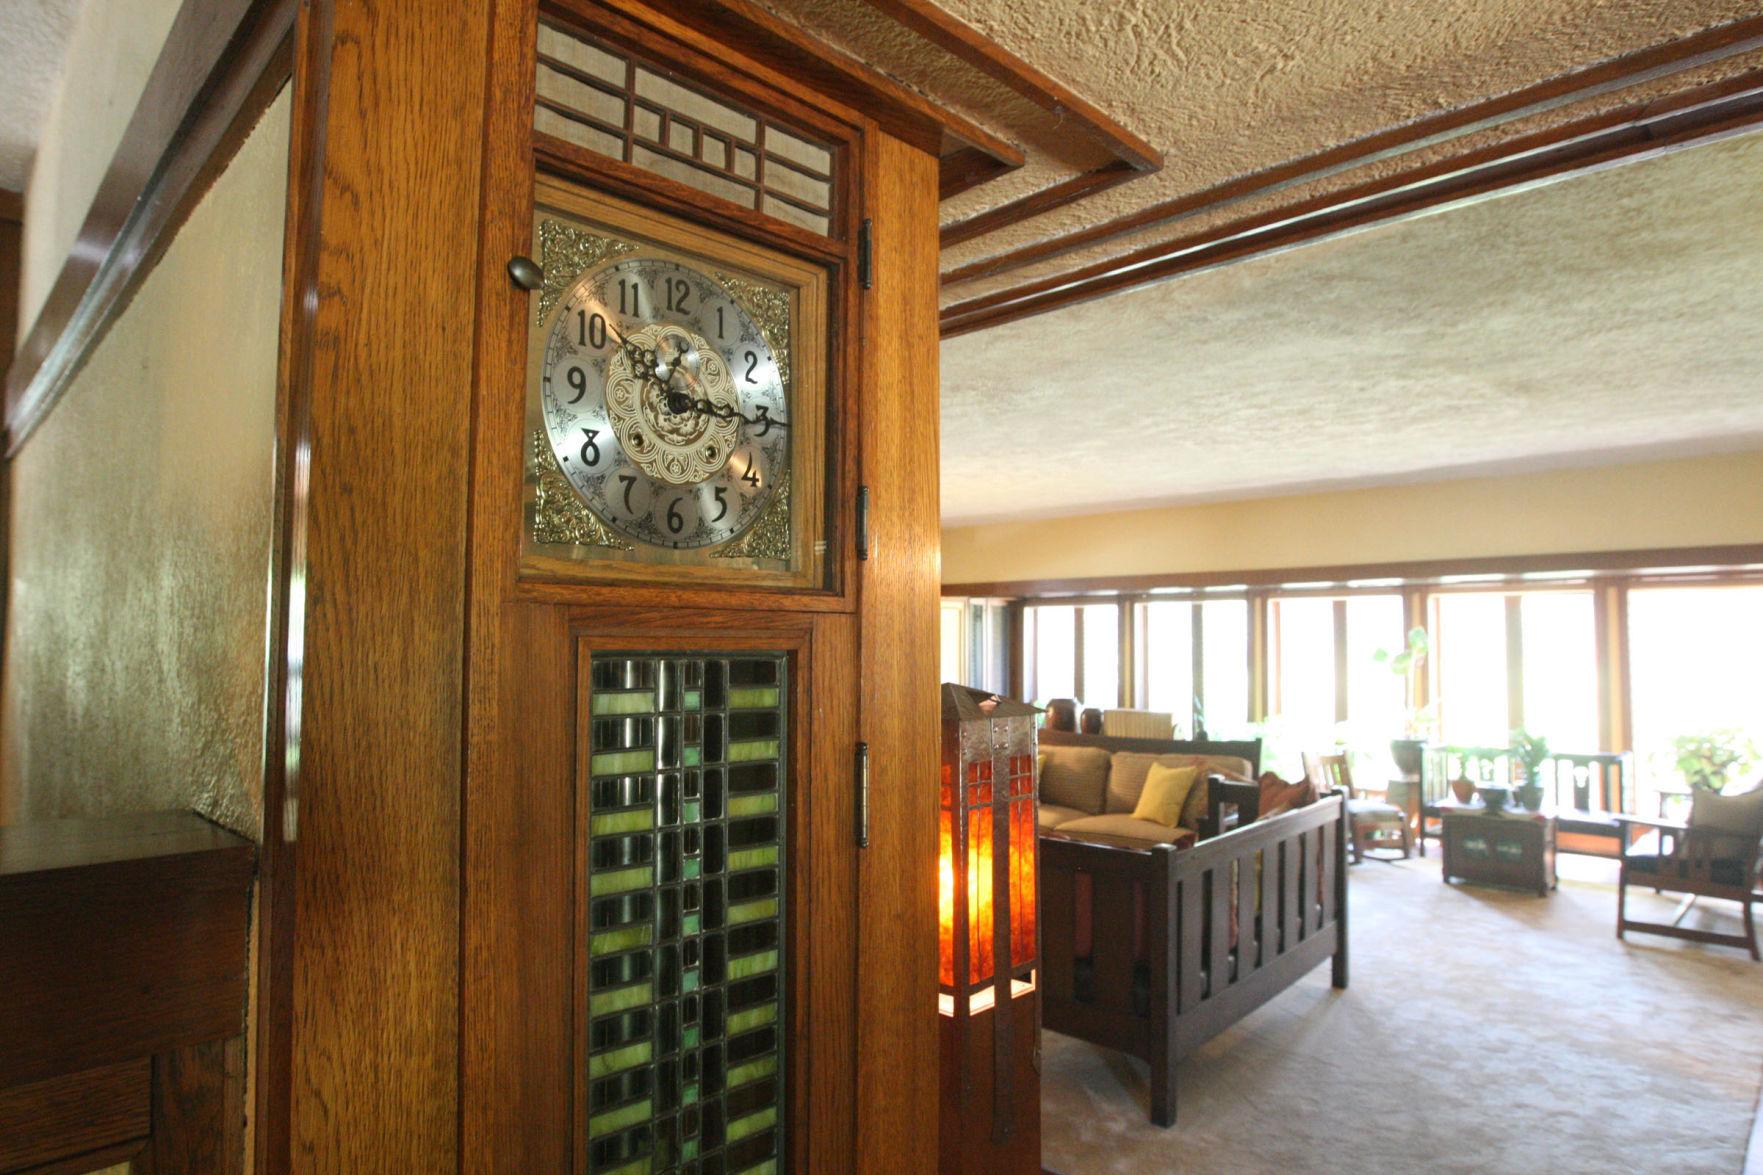 Edward Irving House clock 8917 725000 Decatur